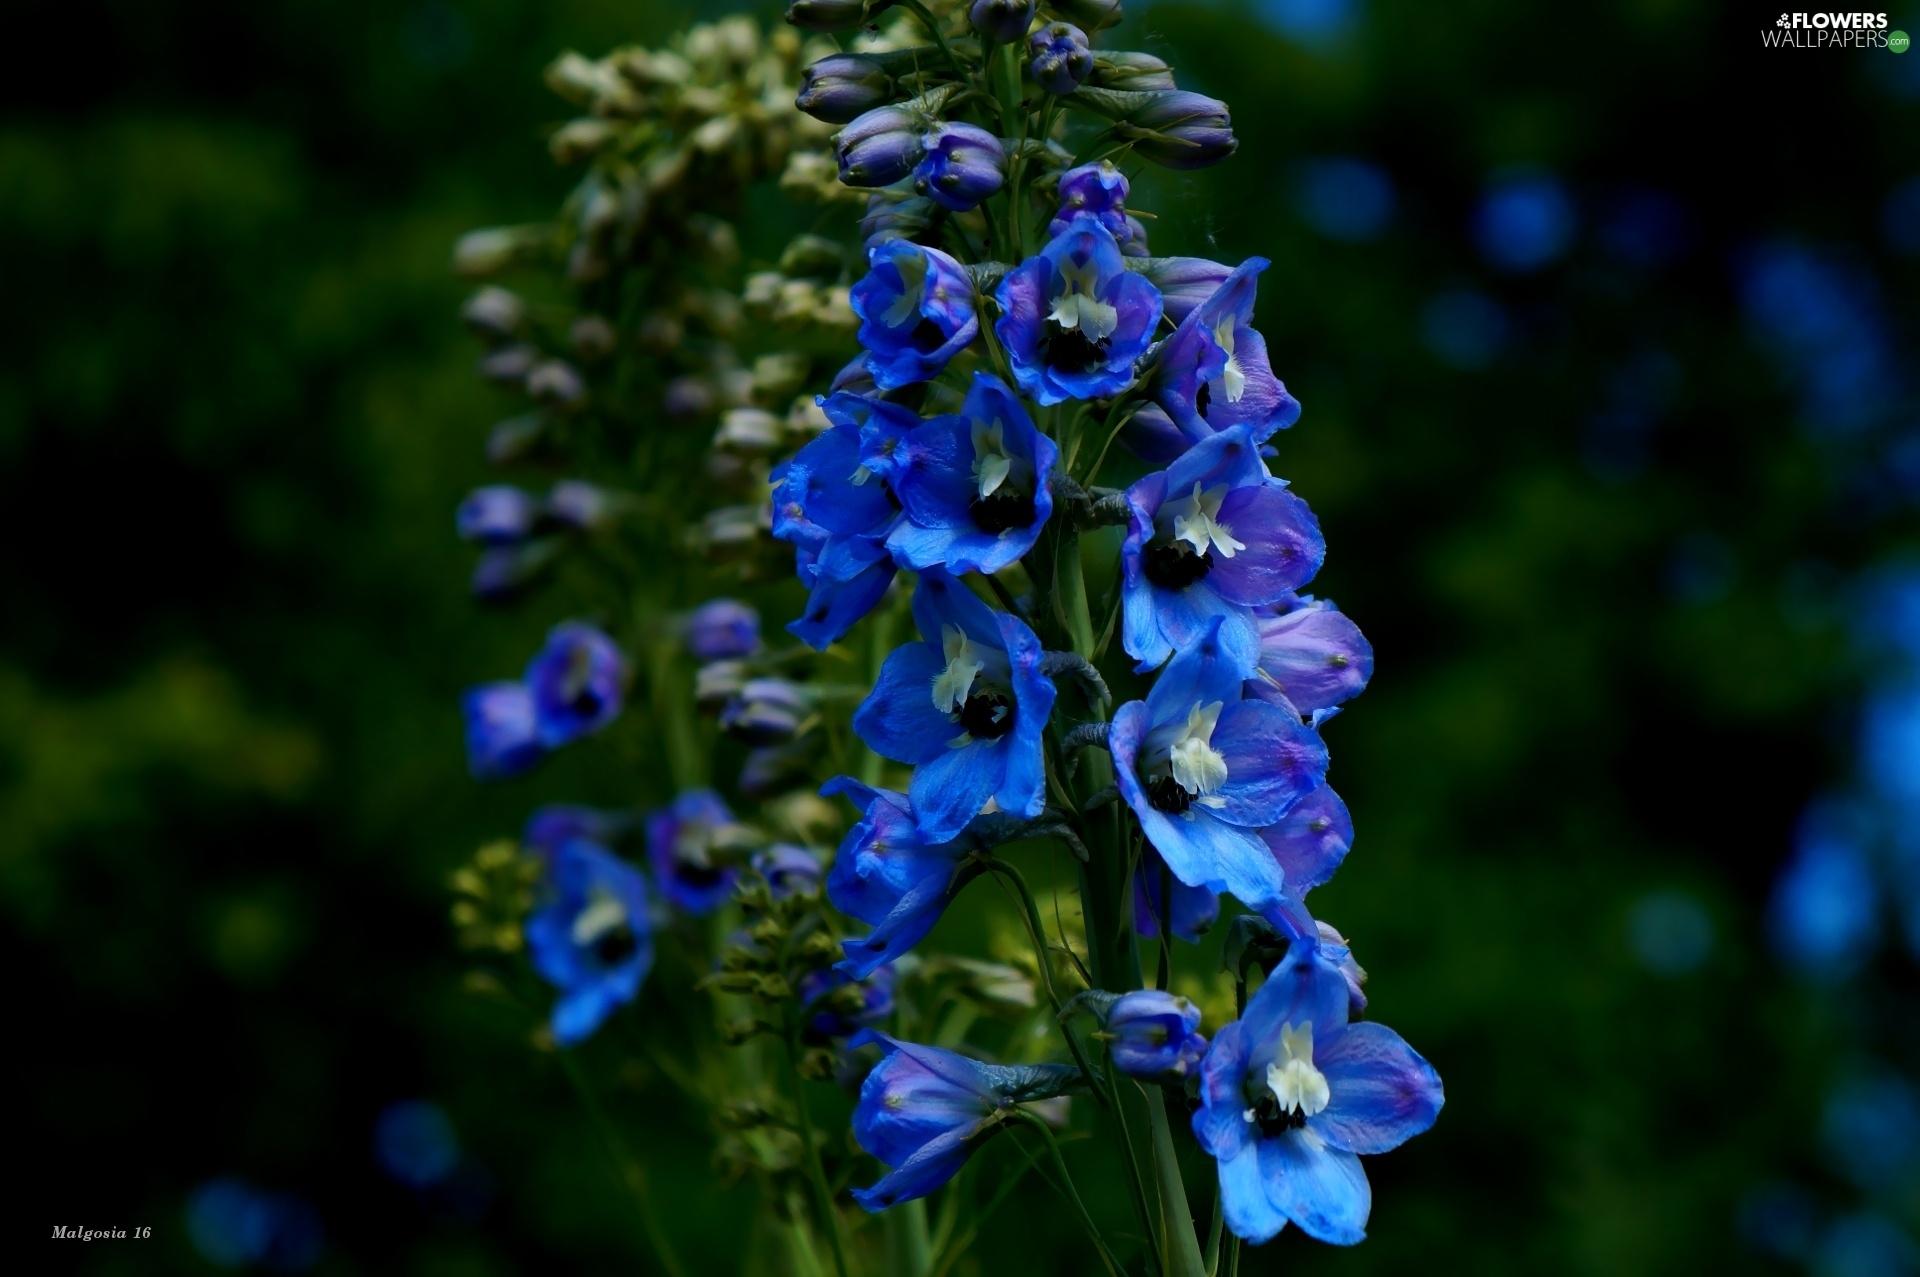 blue, garden, flowers, larkspur - flowers wallpapers: 1920x1277